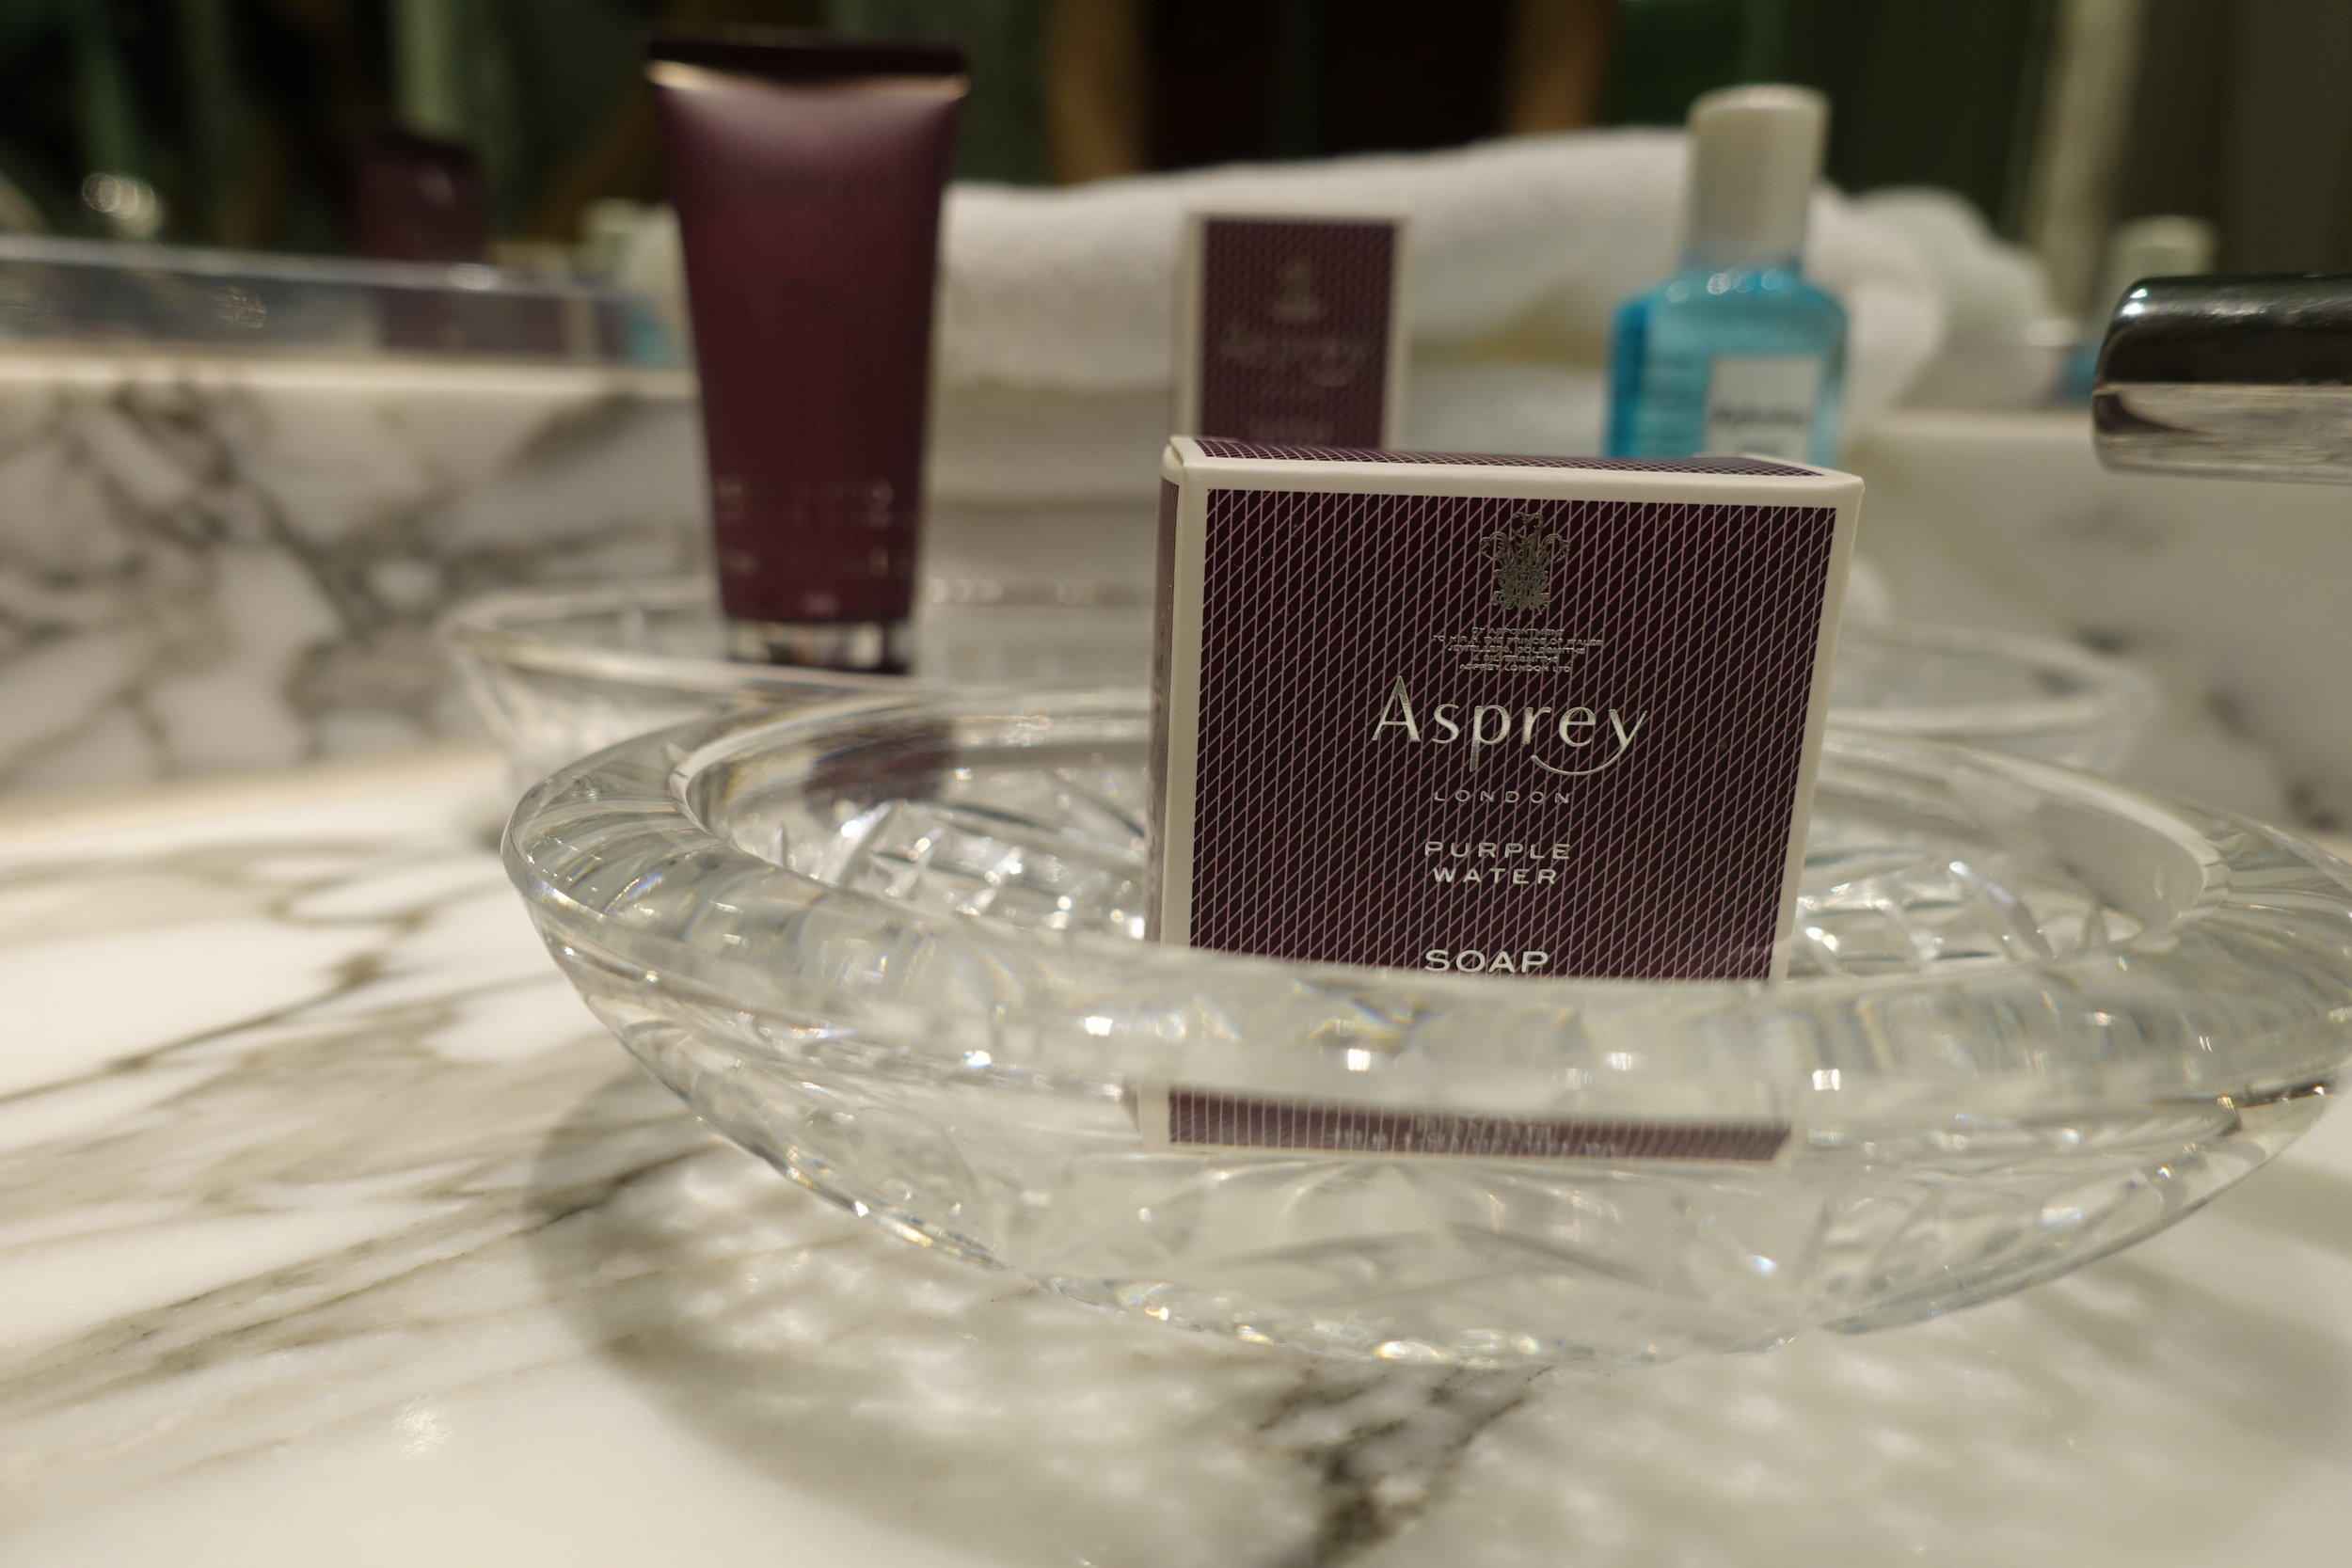 Asprey amenities